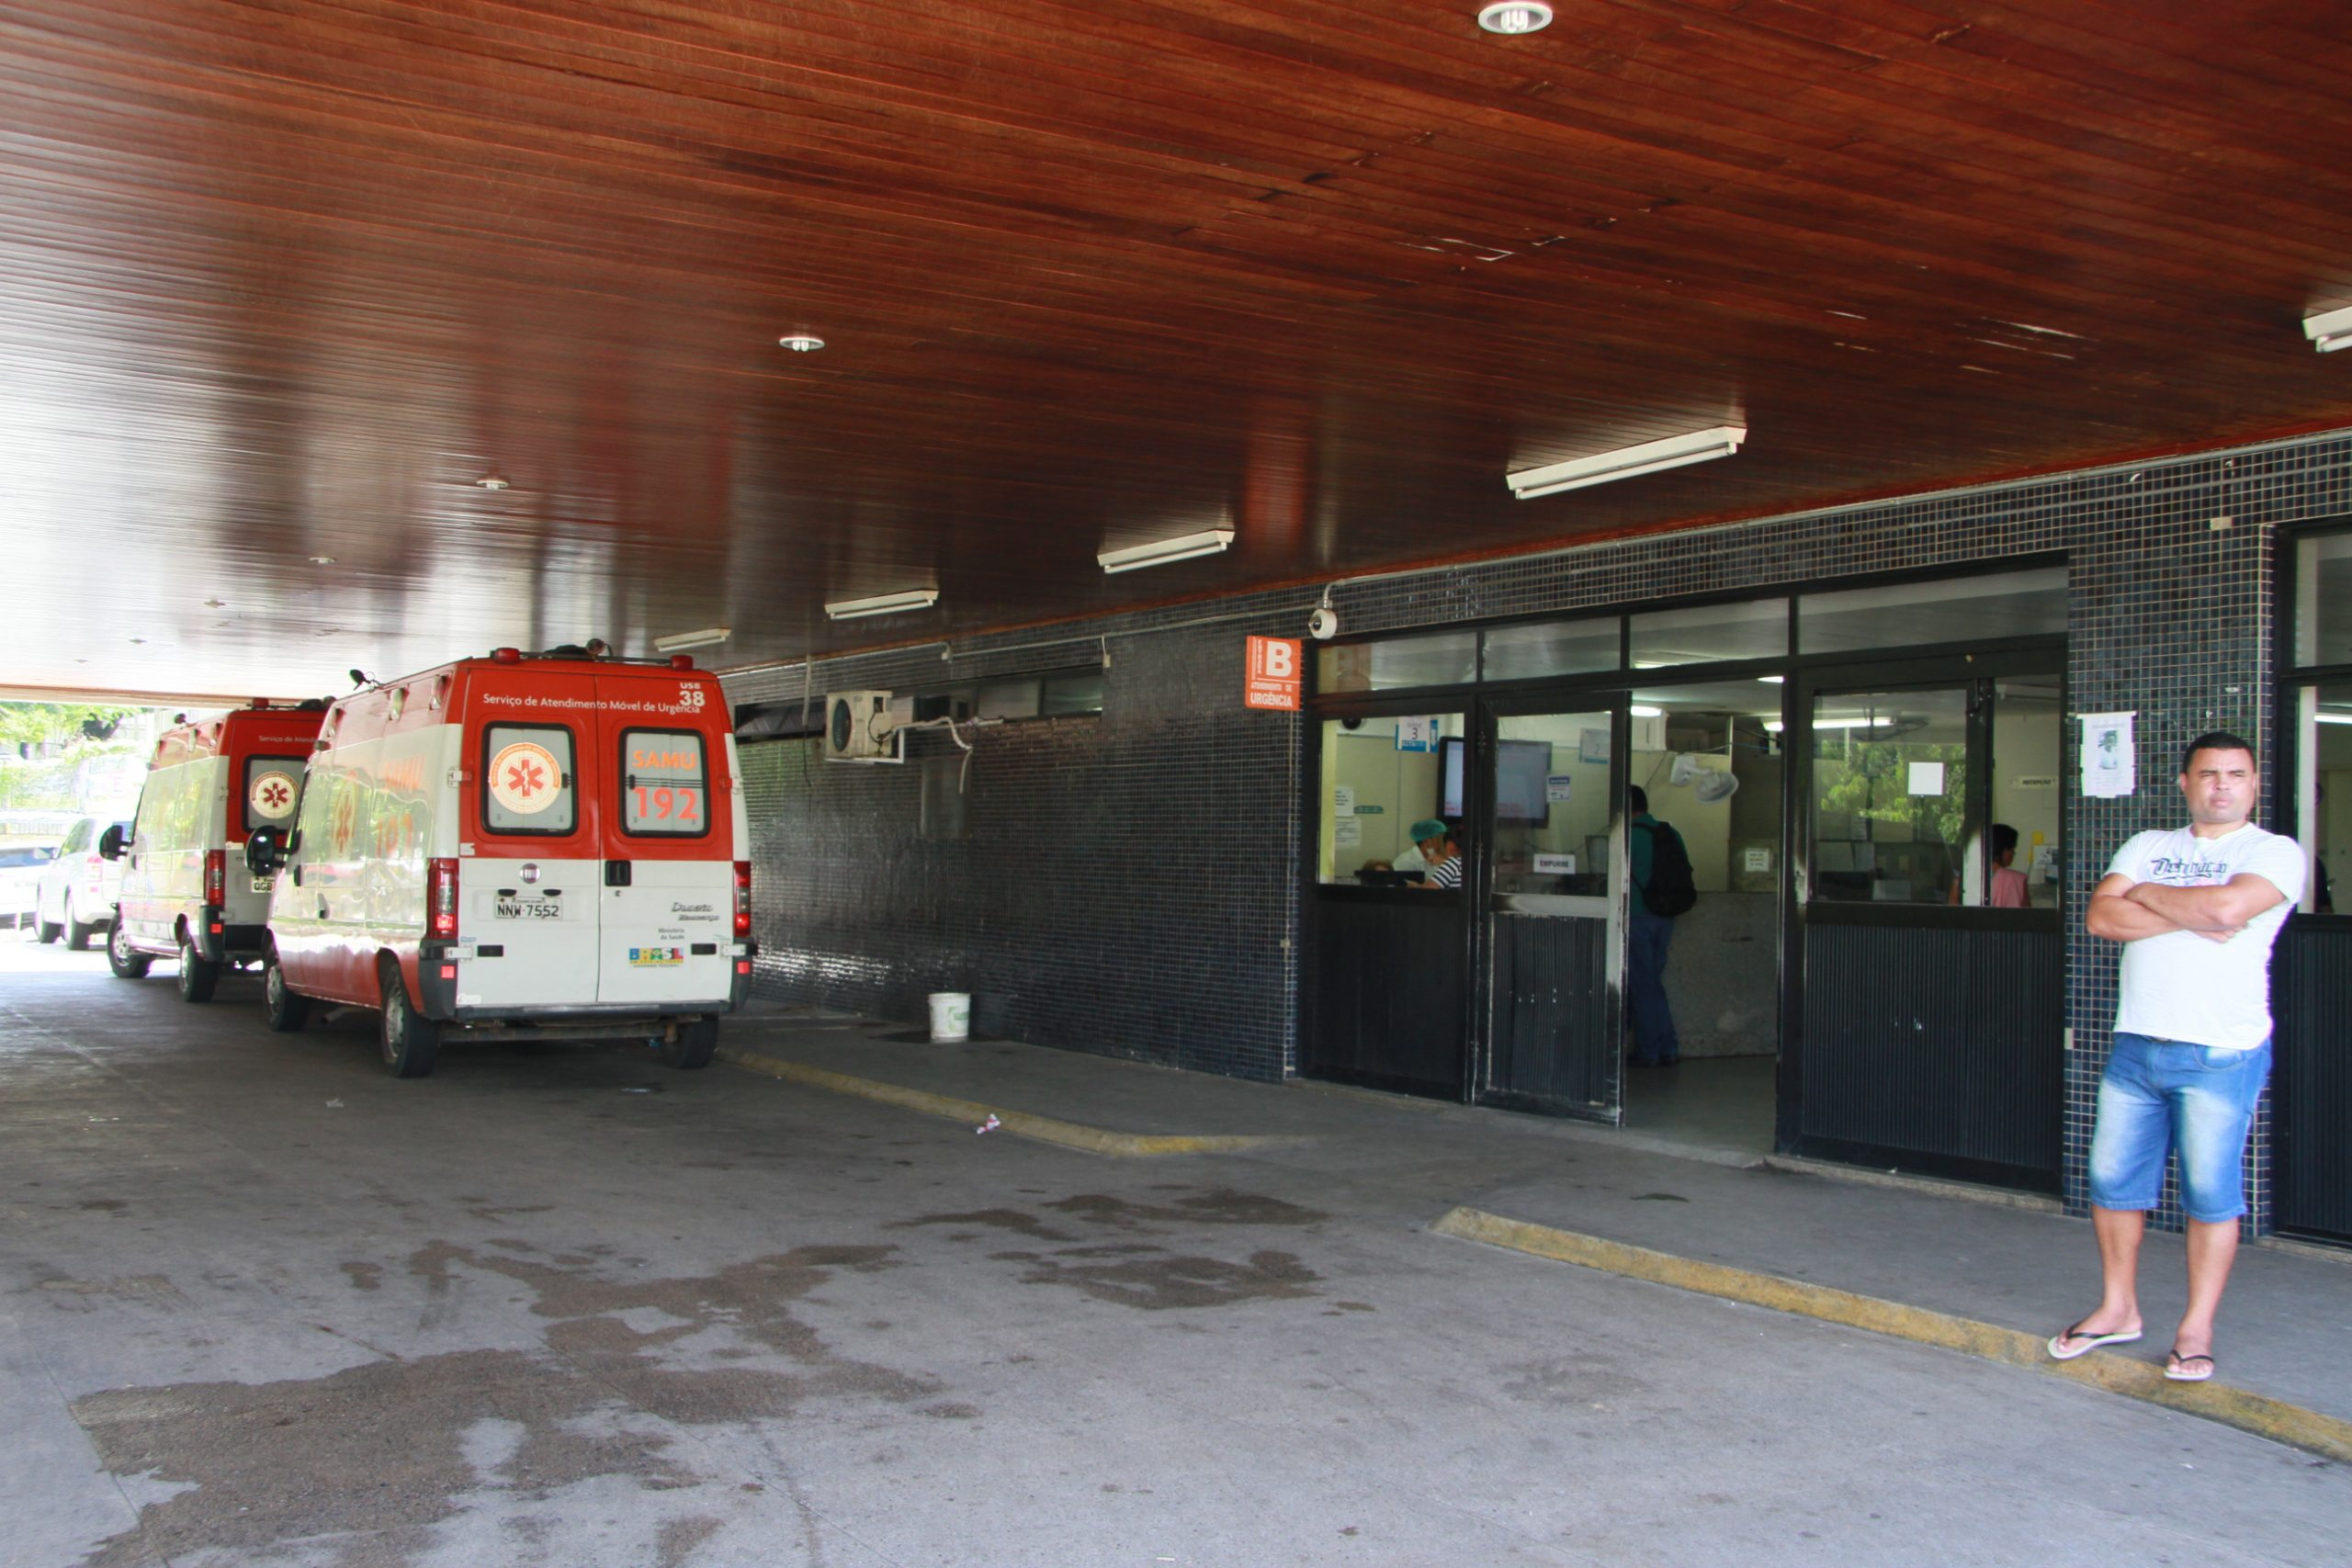 Hospital Walfredo Gurgel 44 scaled